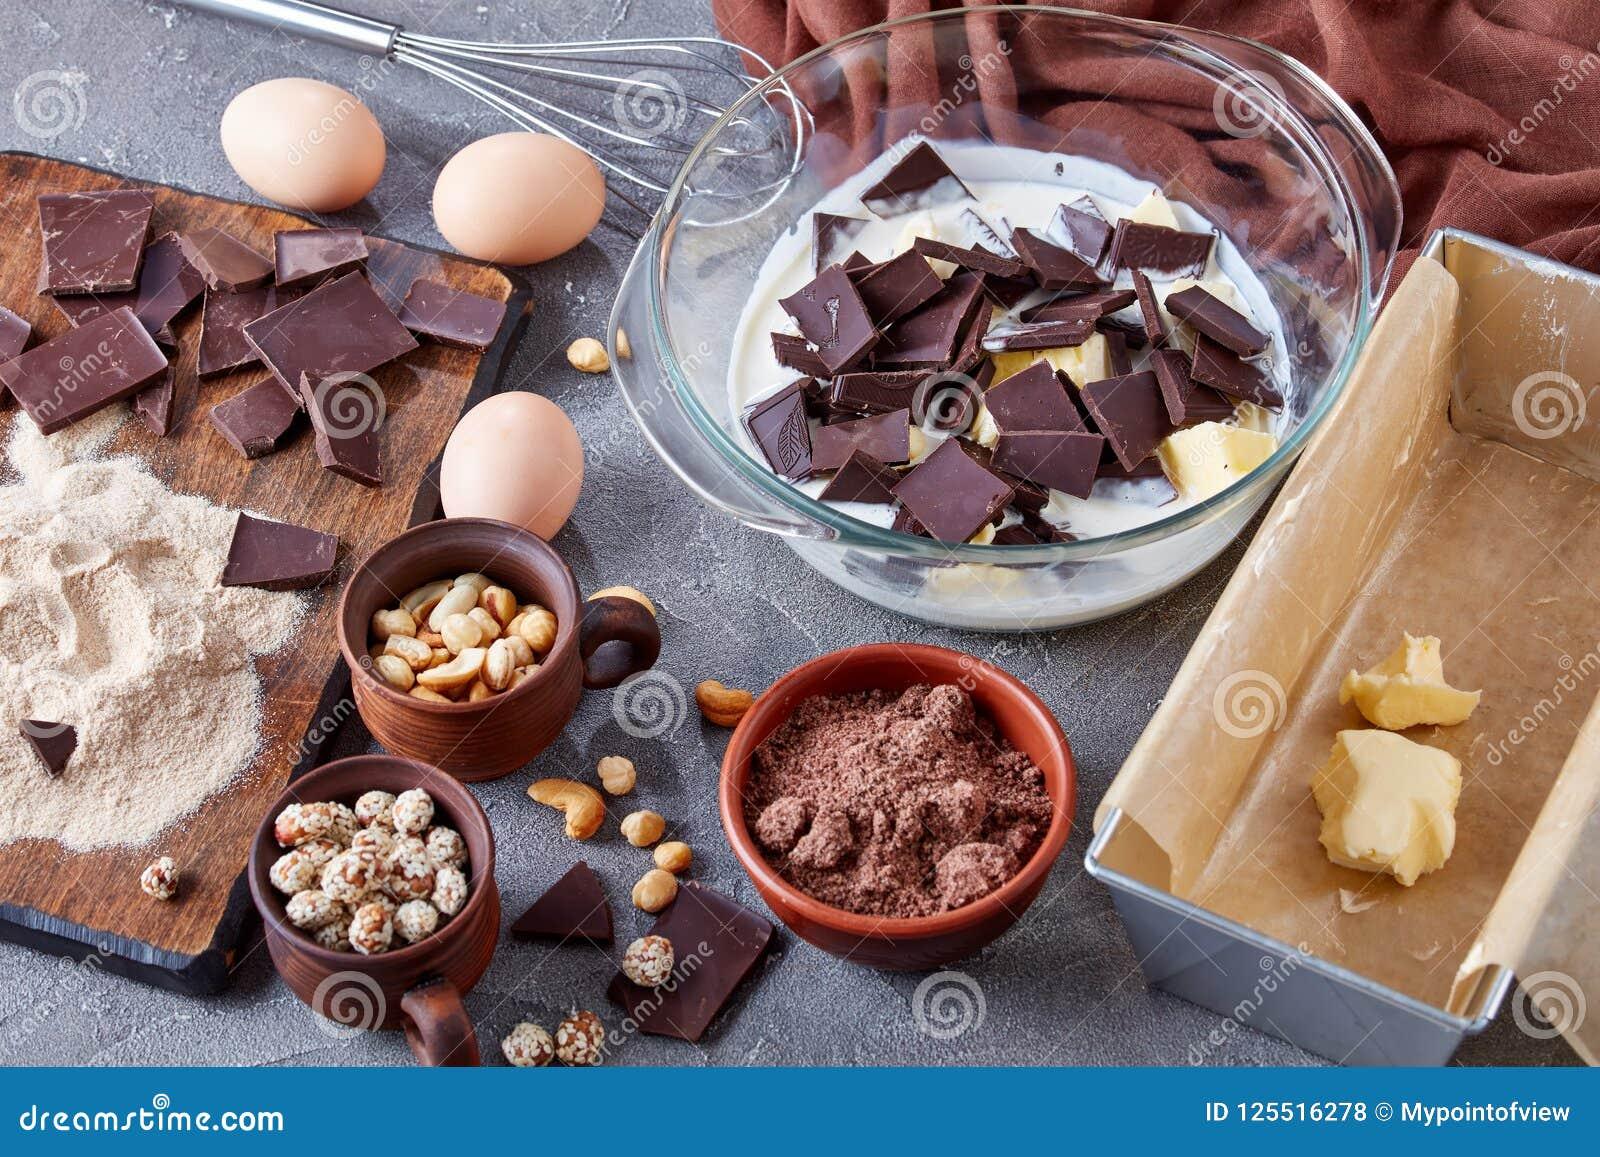 Making chocolate pound cake, top view